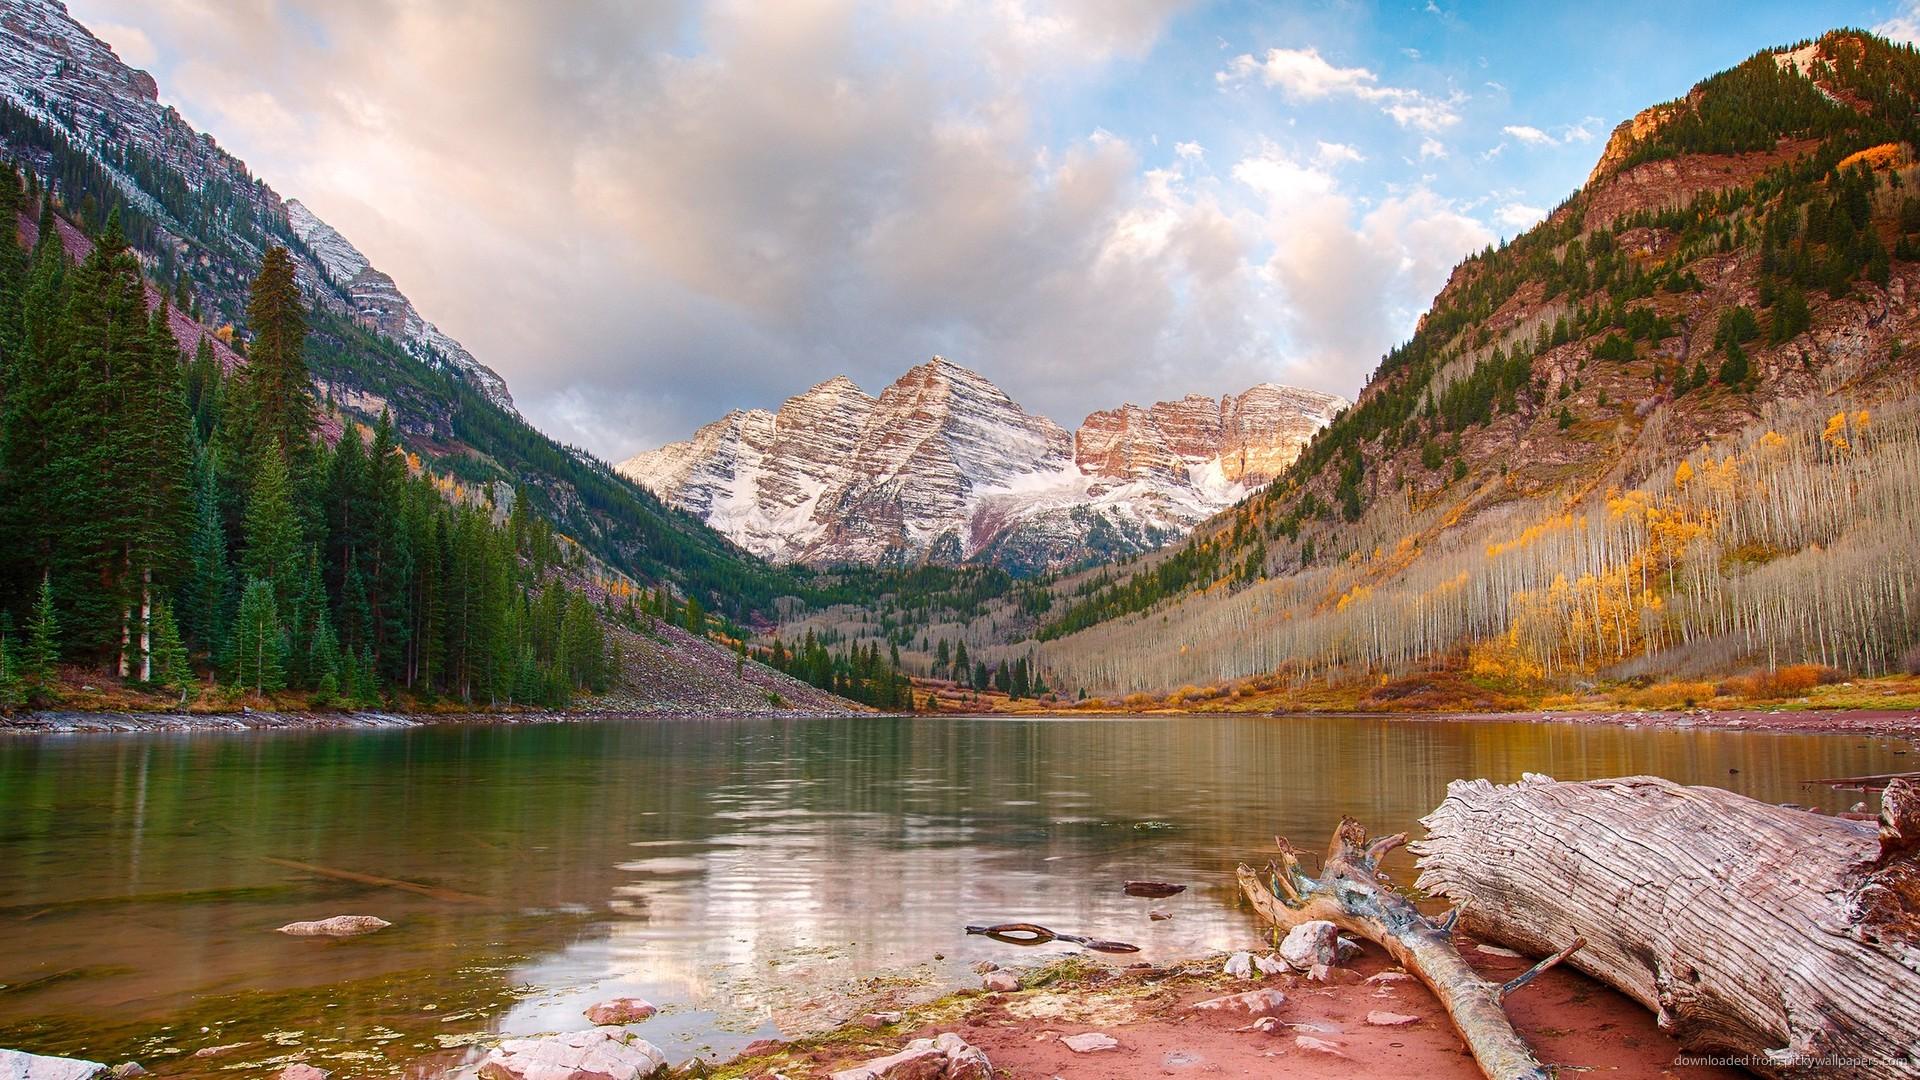 Aspen Colorado Picture For iPhone Blackberry iPad Aspen Colorado 1920x1080